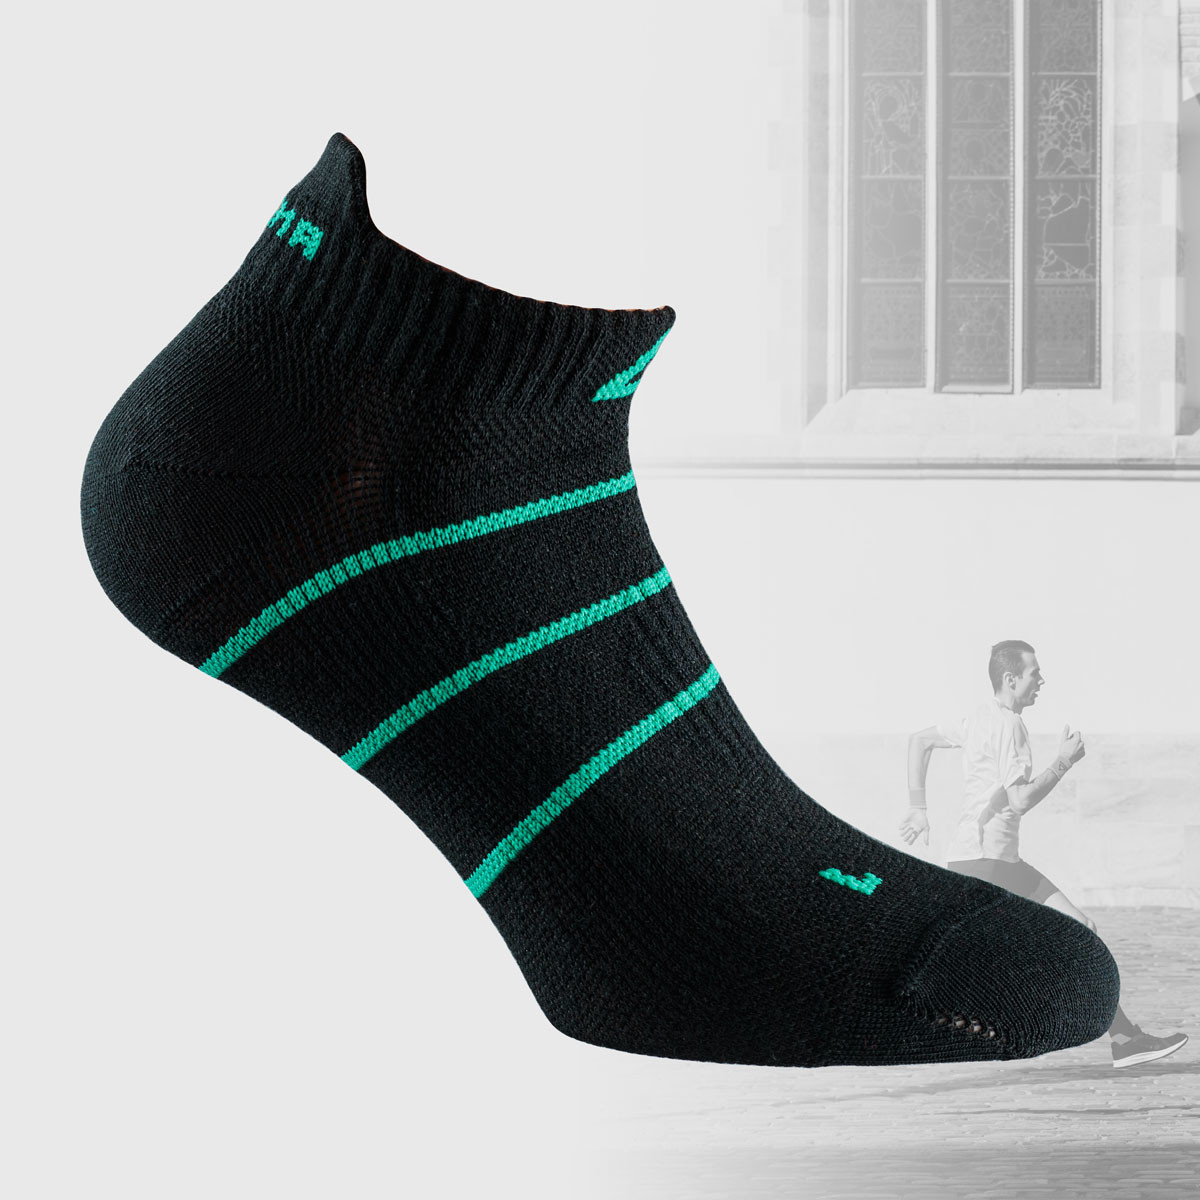 black running socks with green stripes